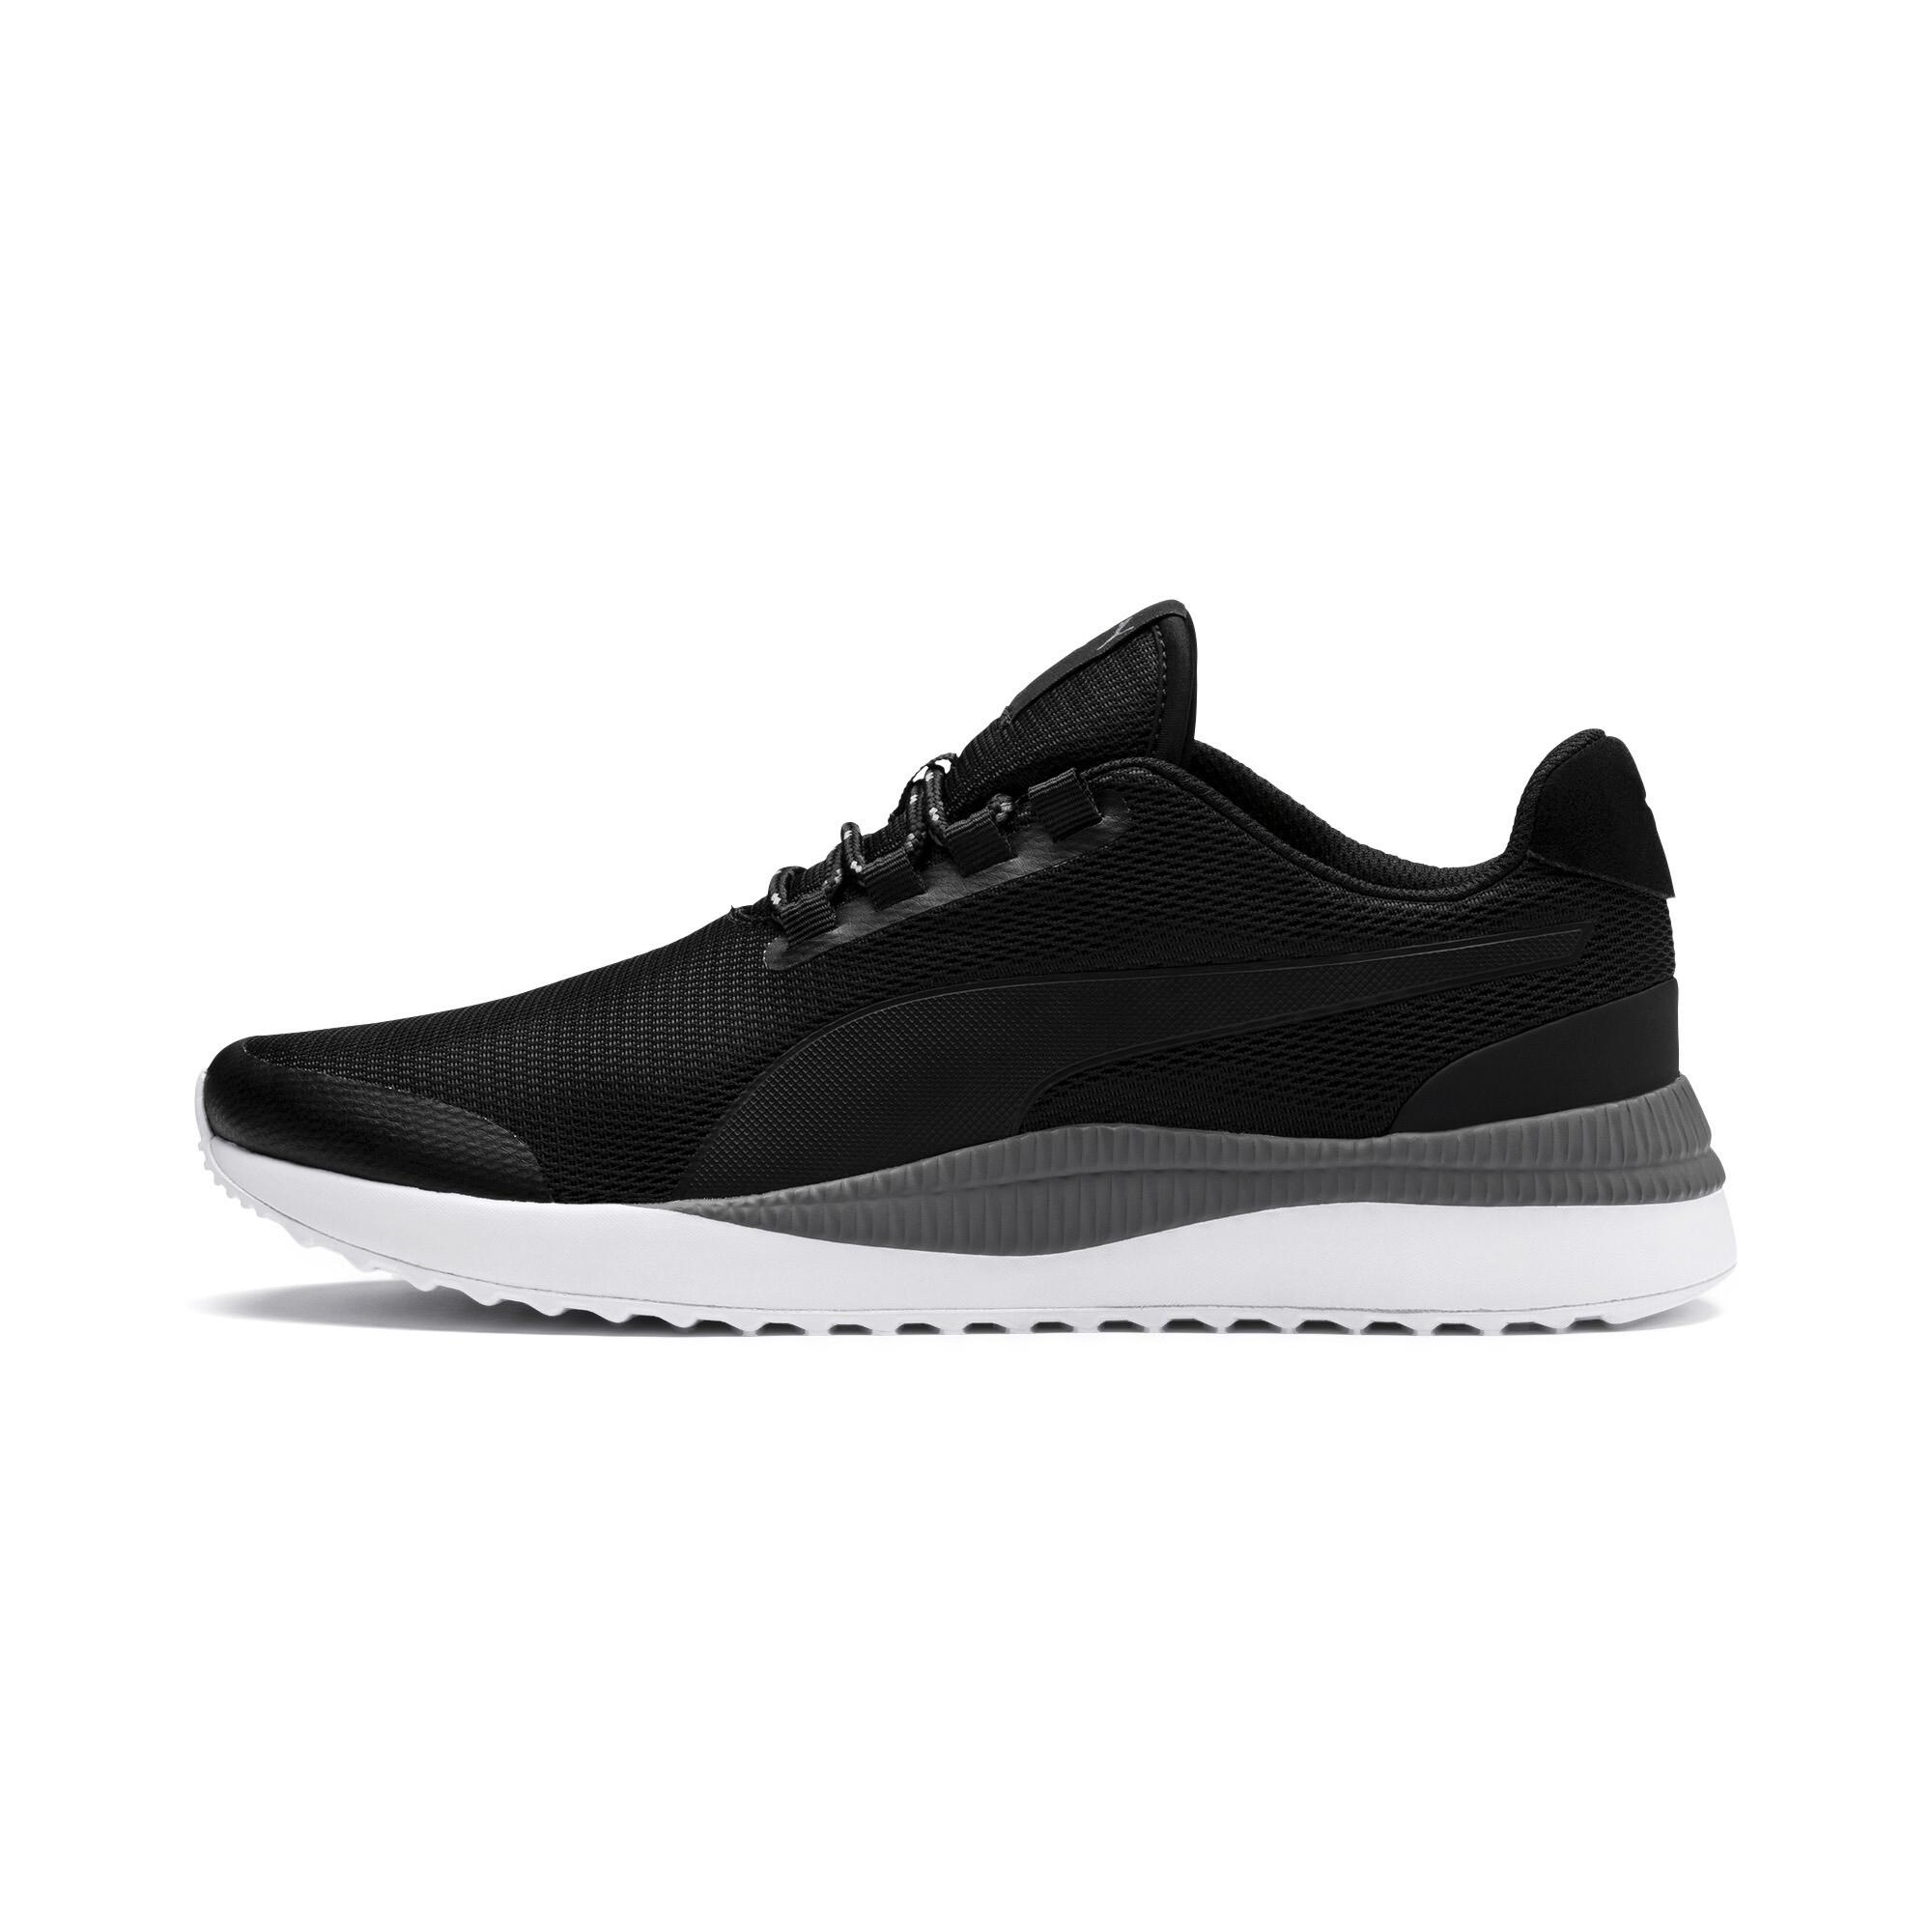 PUMA-Pacer-Next-FS-Men-039-s-Sneakers-Unisex-Shoe-Basics thumbnail 4